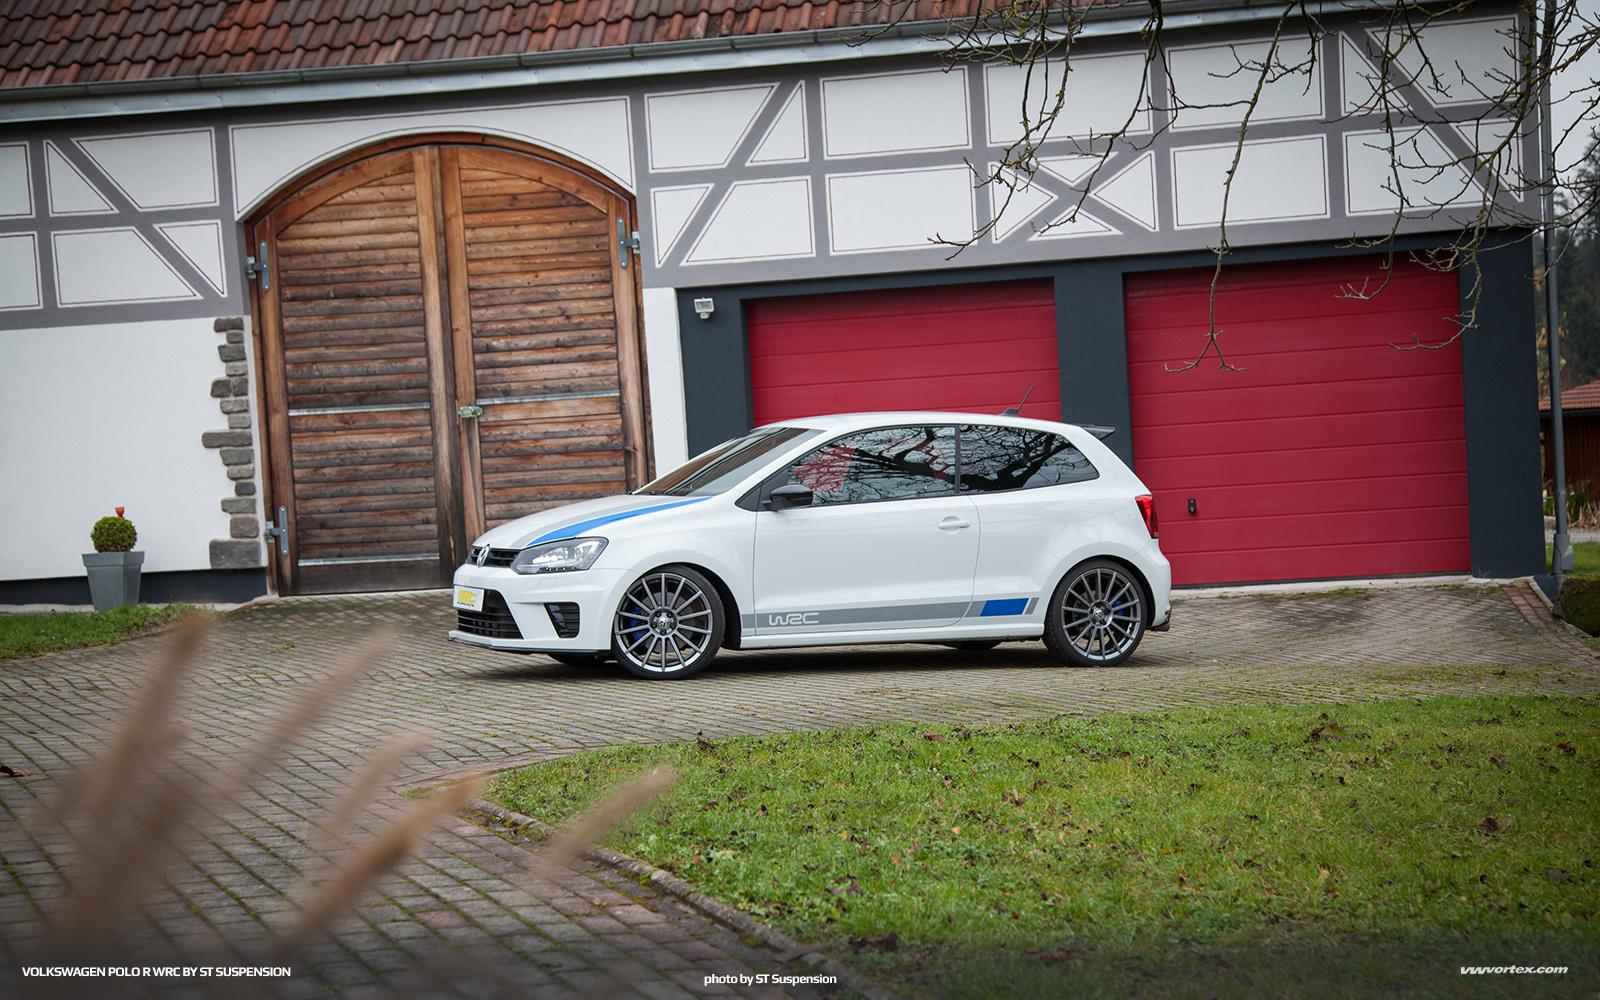 Audi A1 Sportback active kit (photo: Audi AG)